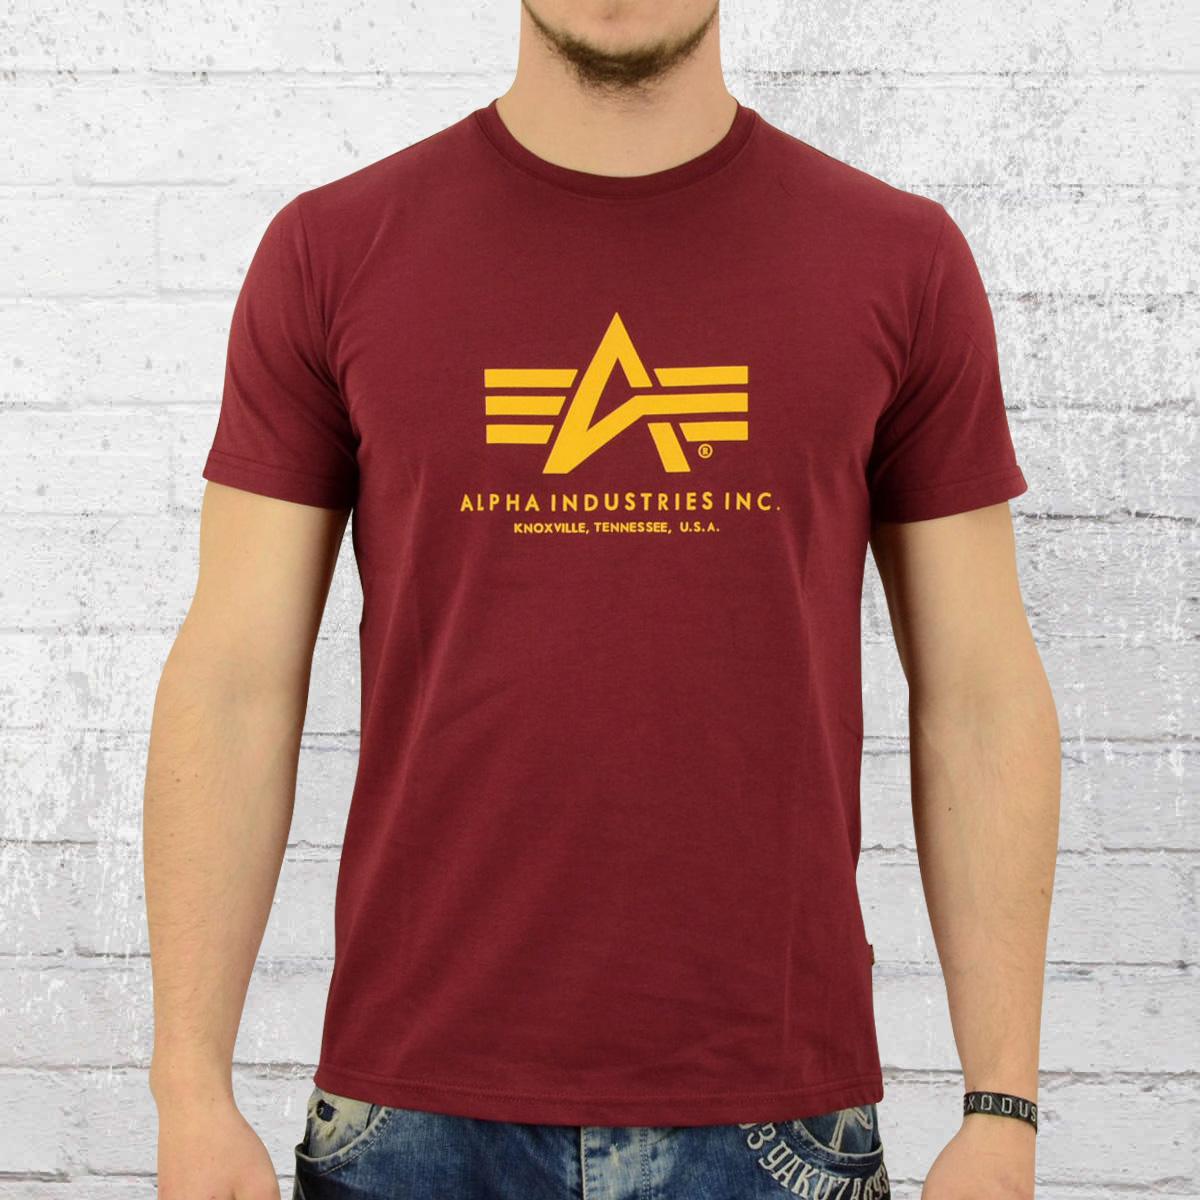 order now alpha industries male t shirt basic t burgundy. Black Bedroom Furniture Sets. Home Design Ideas